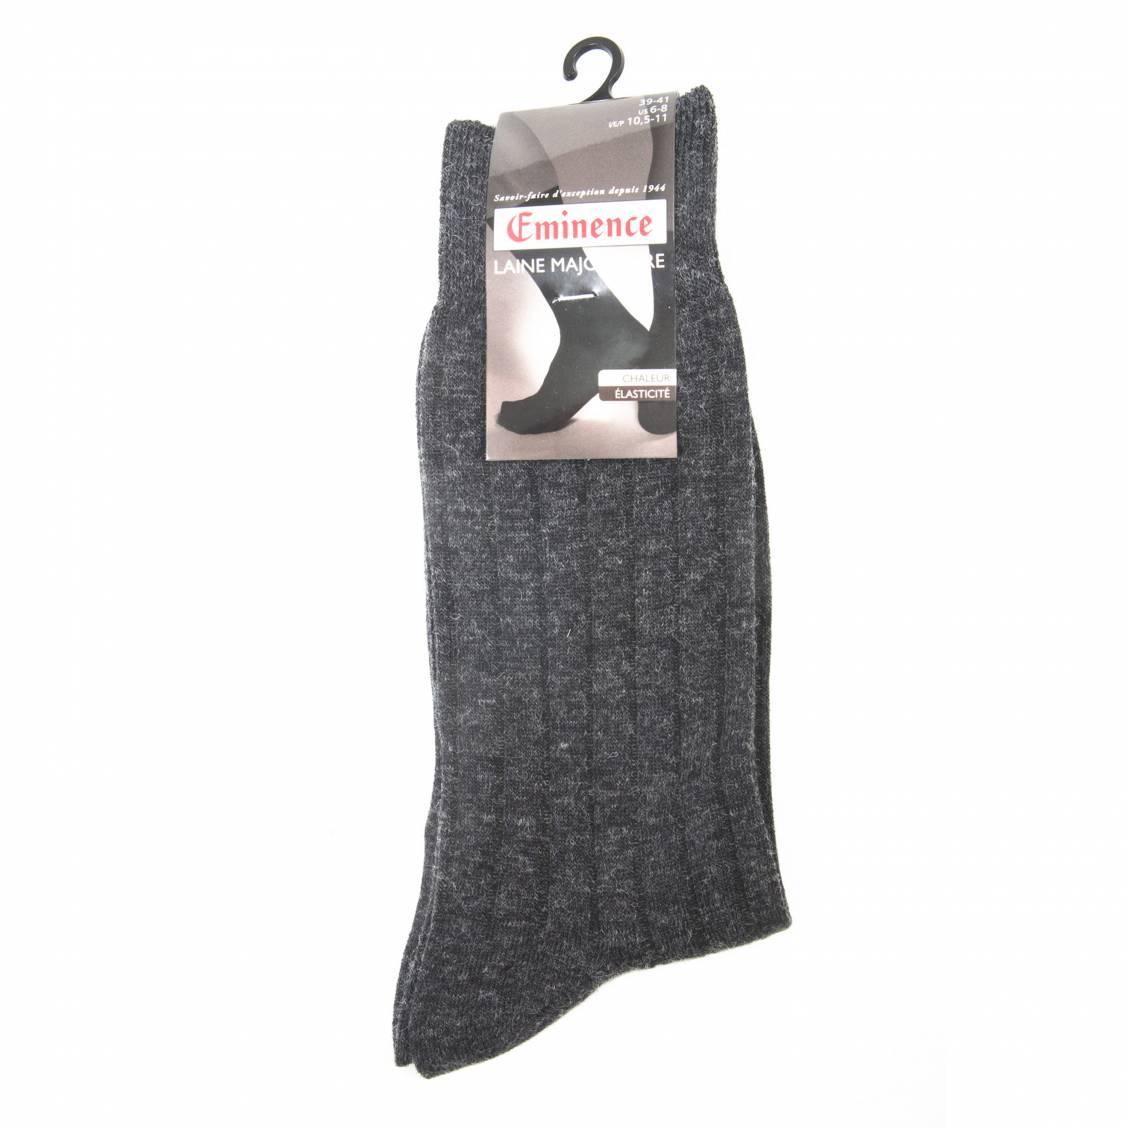 chaussettes eminence c tel es en laine anthracite rue des hommes. Black Bedroom Furniture Sets. Home Design Ideas